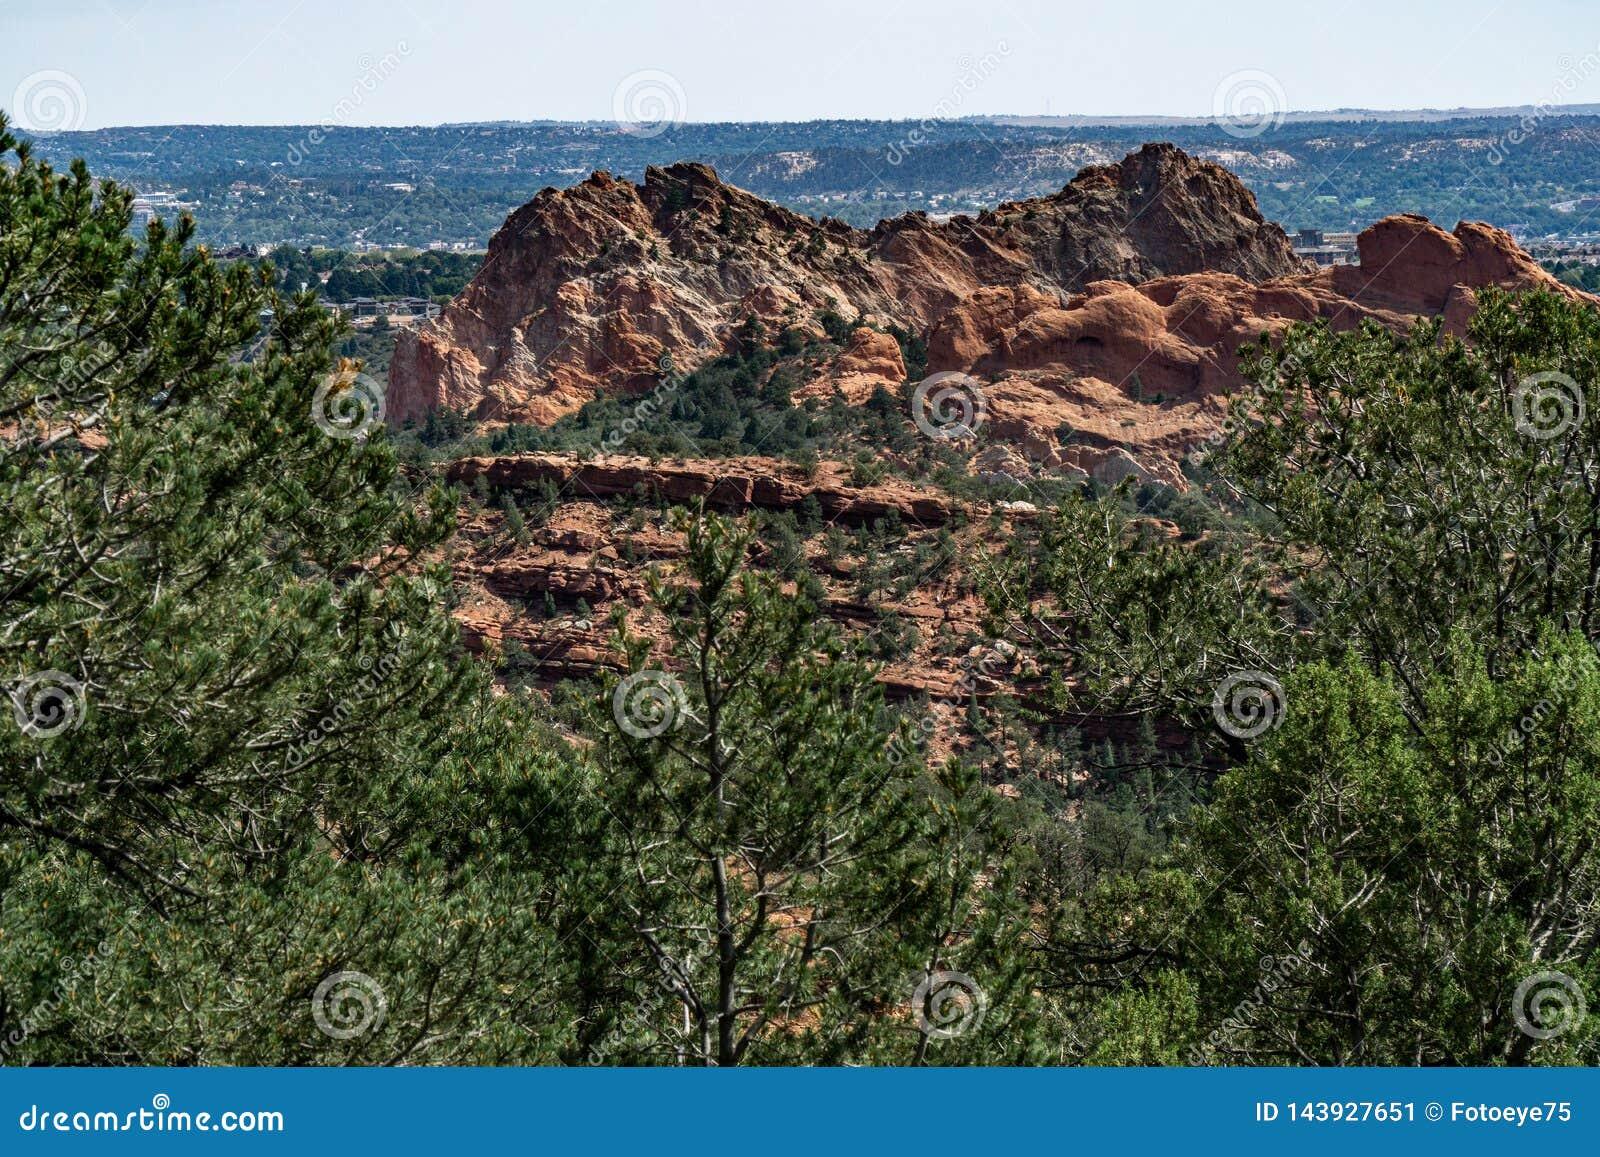 Garden Of The Gods Colorado Springs Pikes Peak Region Stock